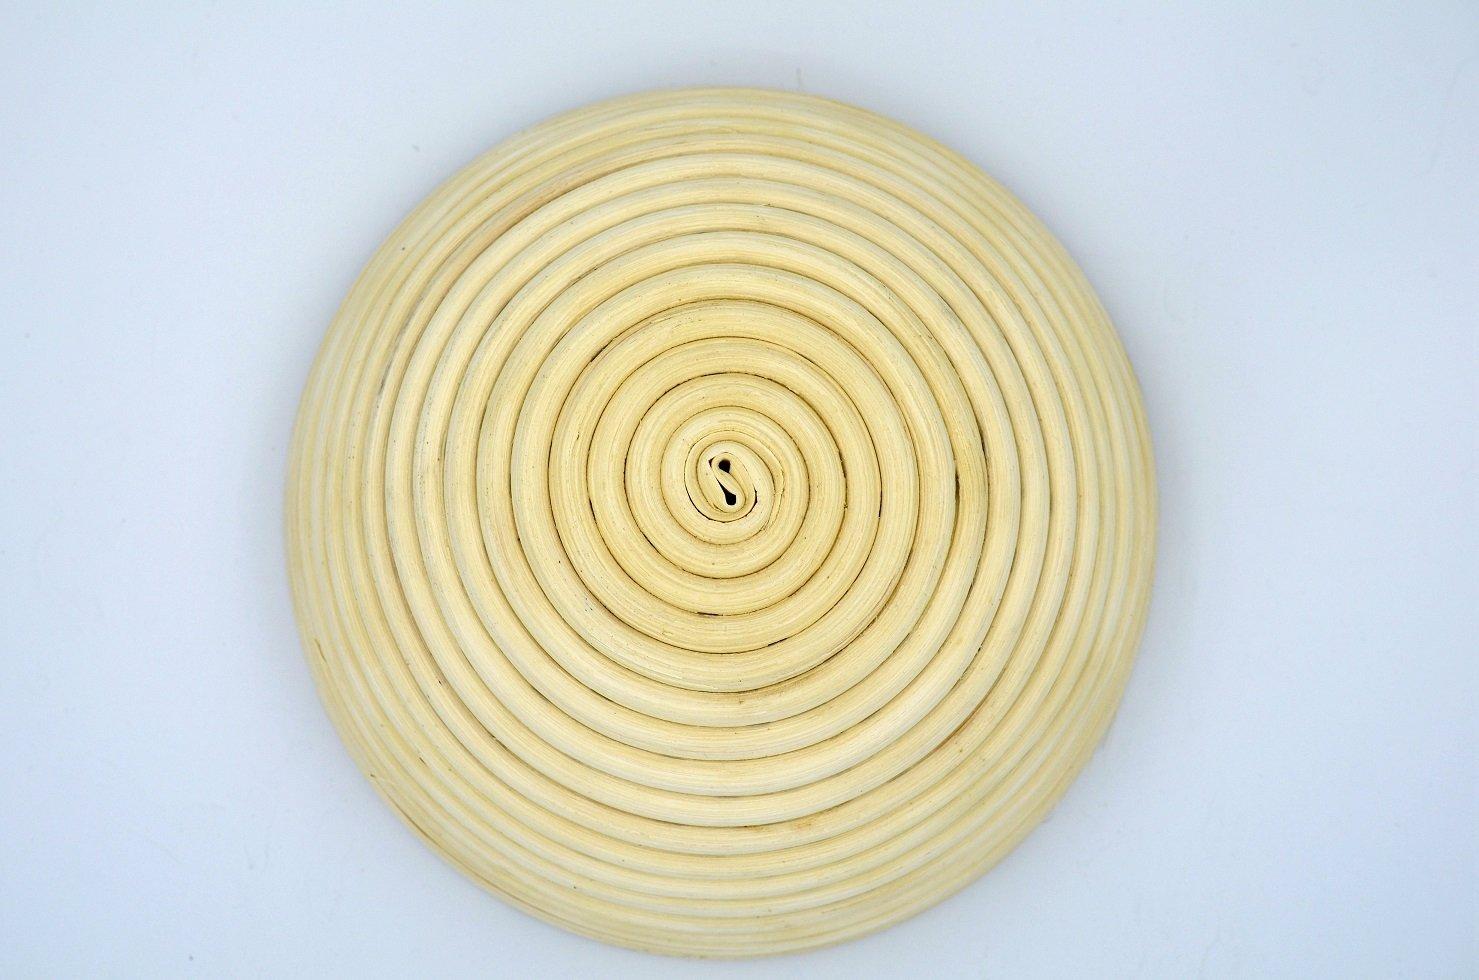 Masterproofing - Cesto Redondo para fermentar masas (hasta 500 g ...